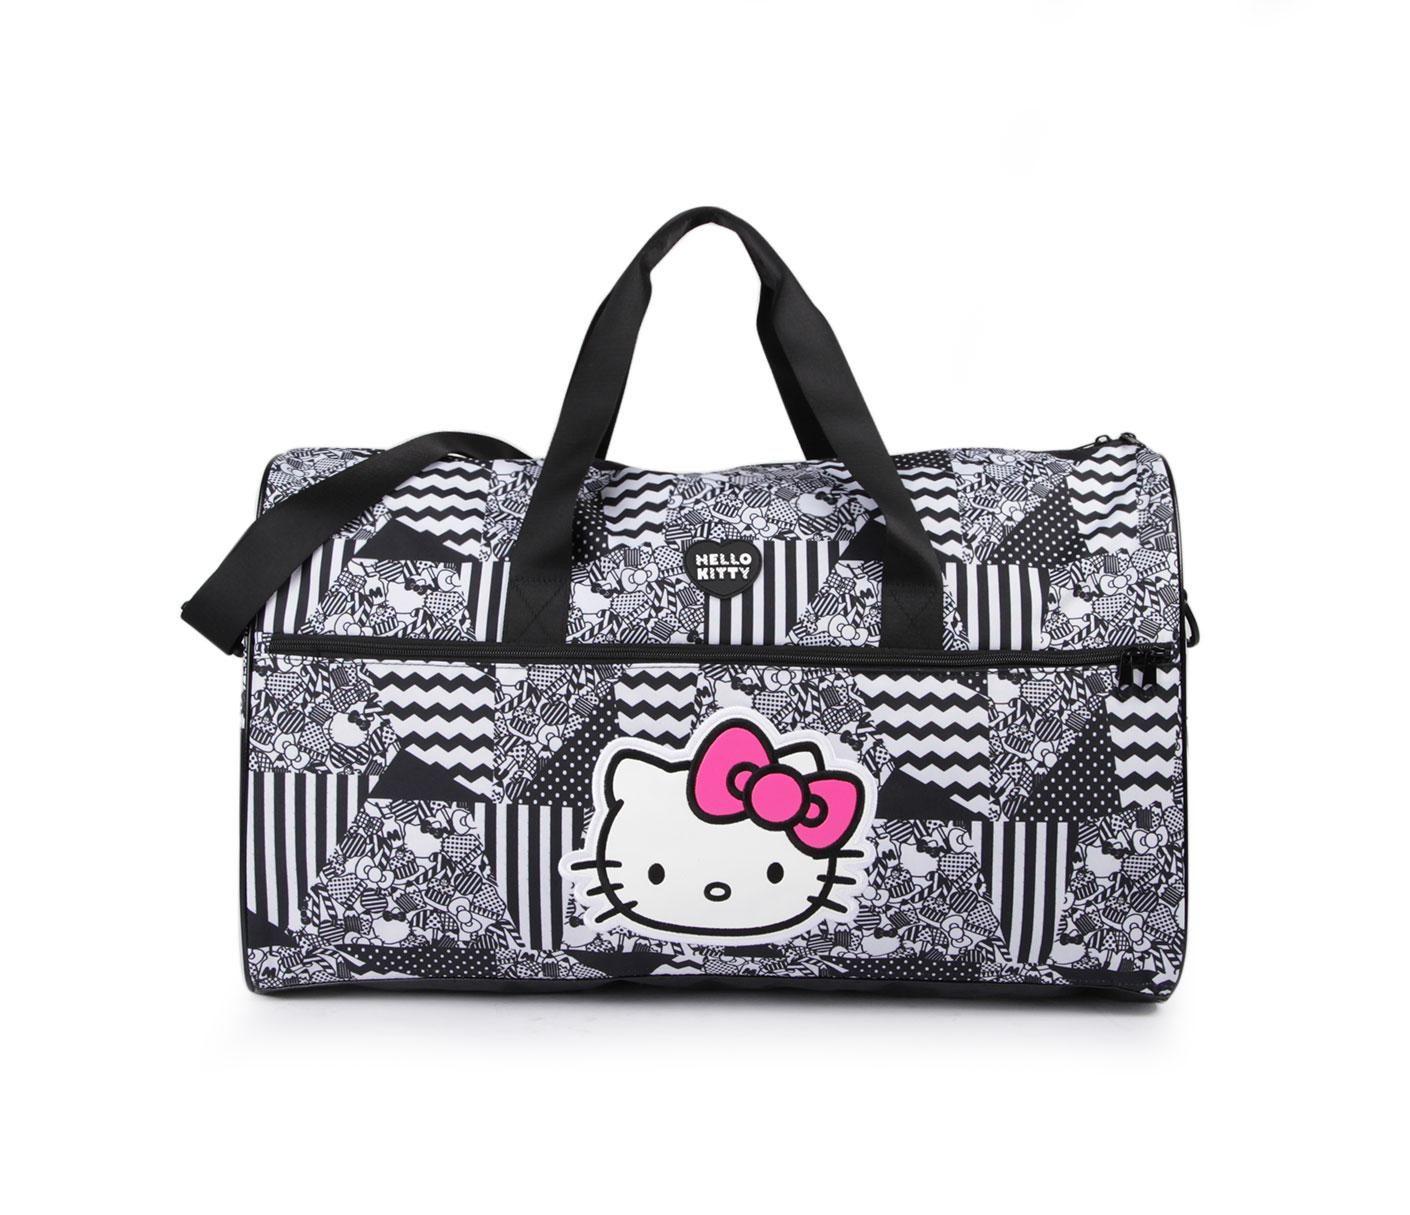 Hello Kitty Overnight Bag: Monotone Collection